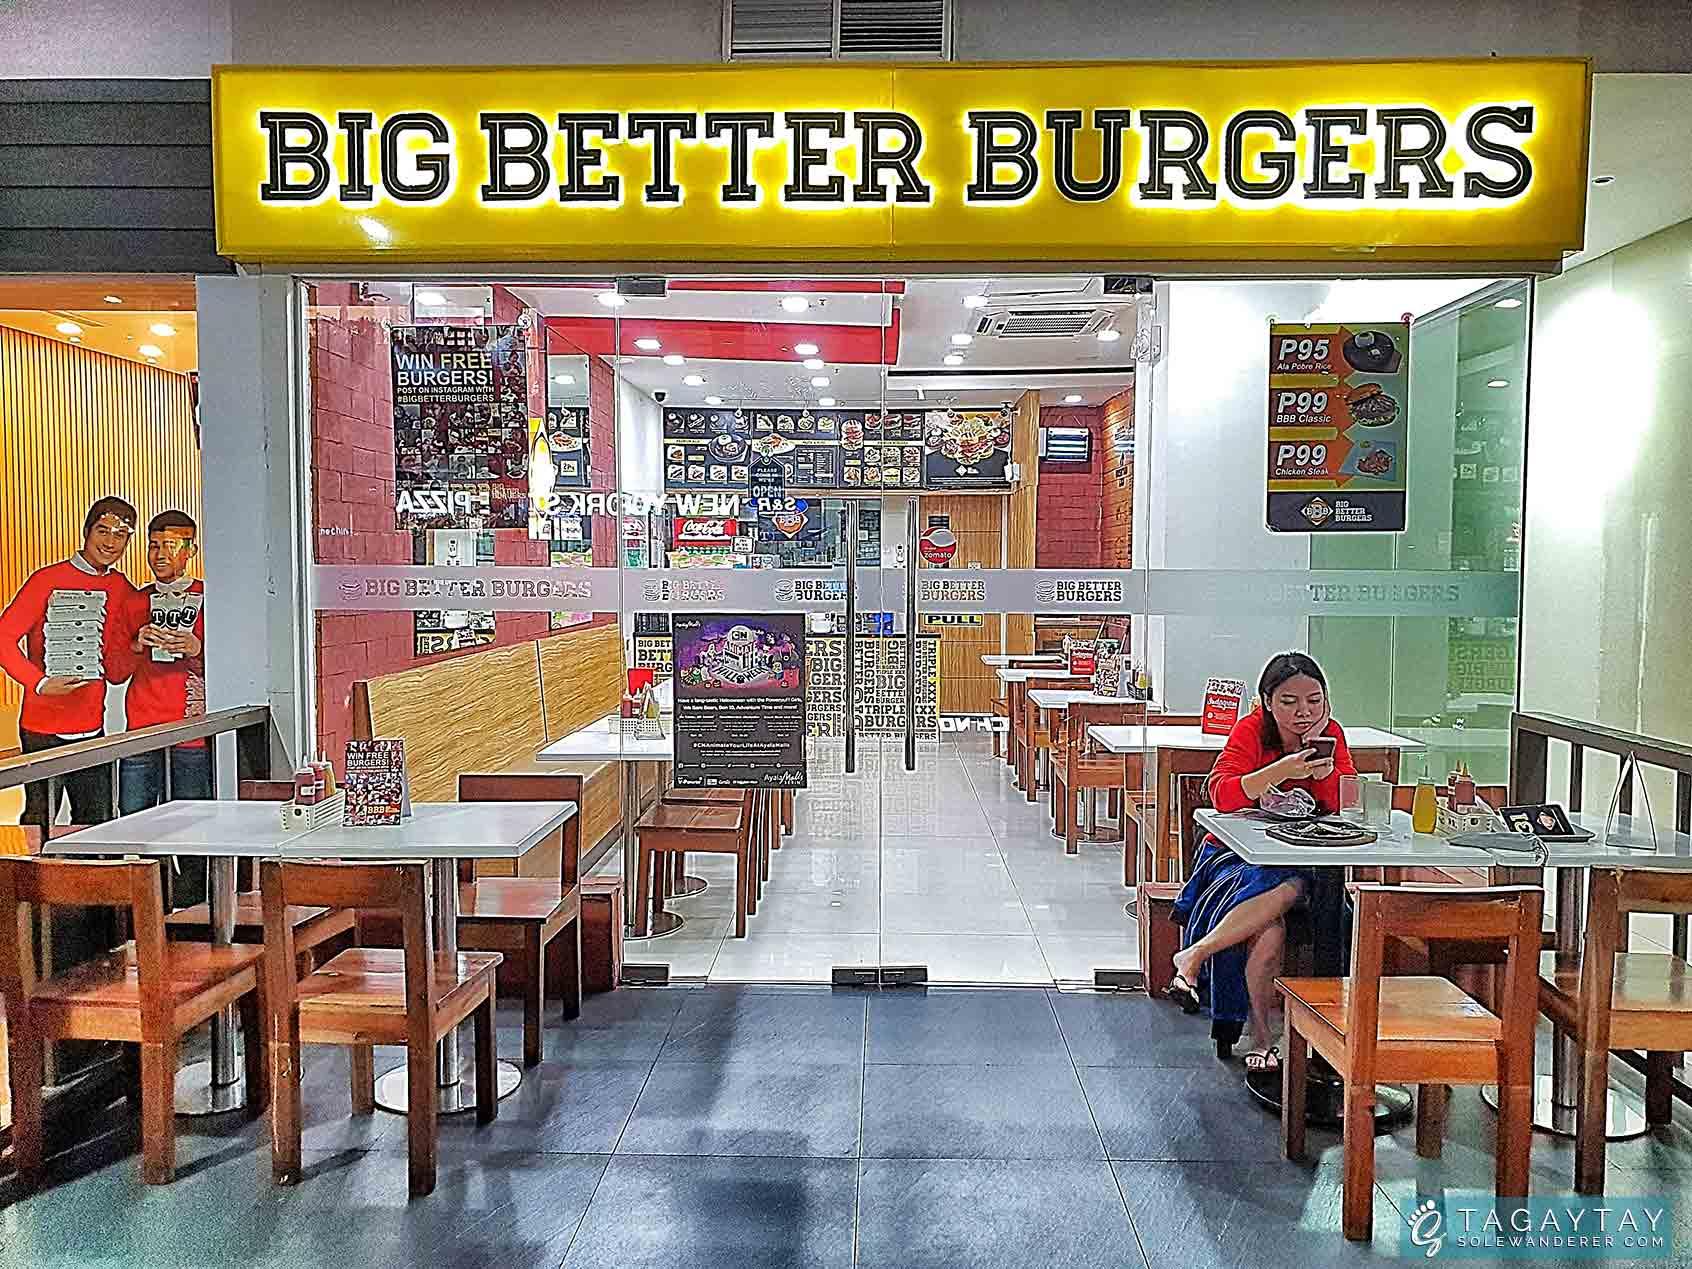 Big Better Burgers in 2nd Floor, Ayala Malls Serin